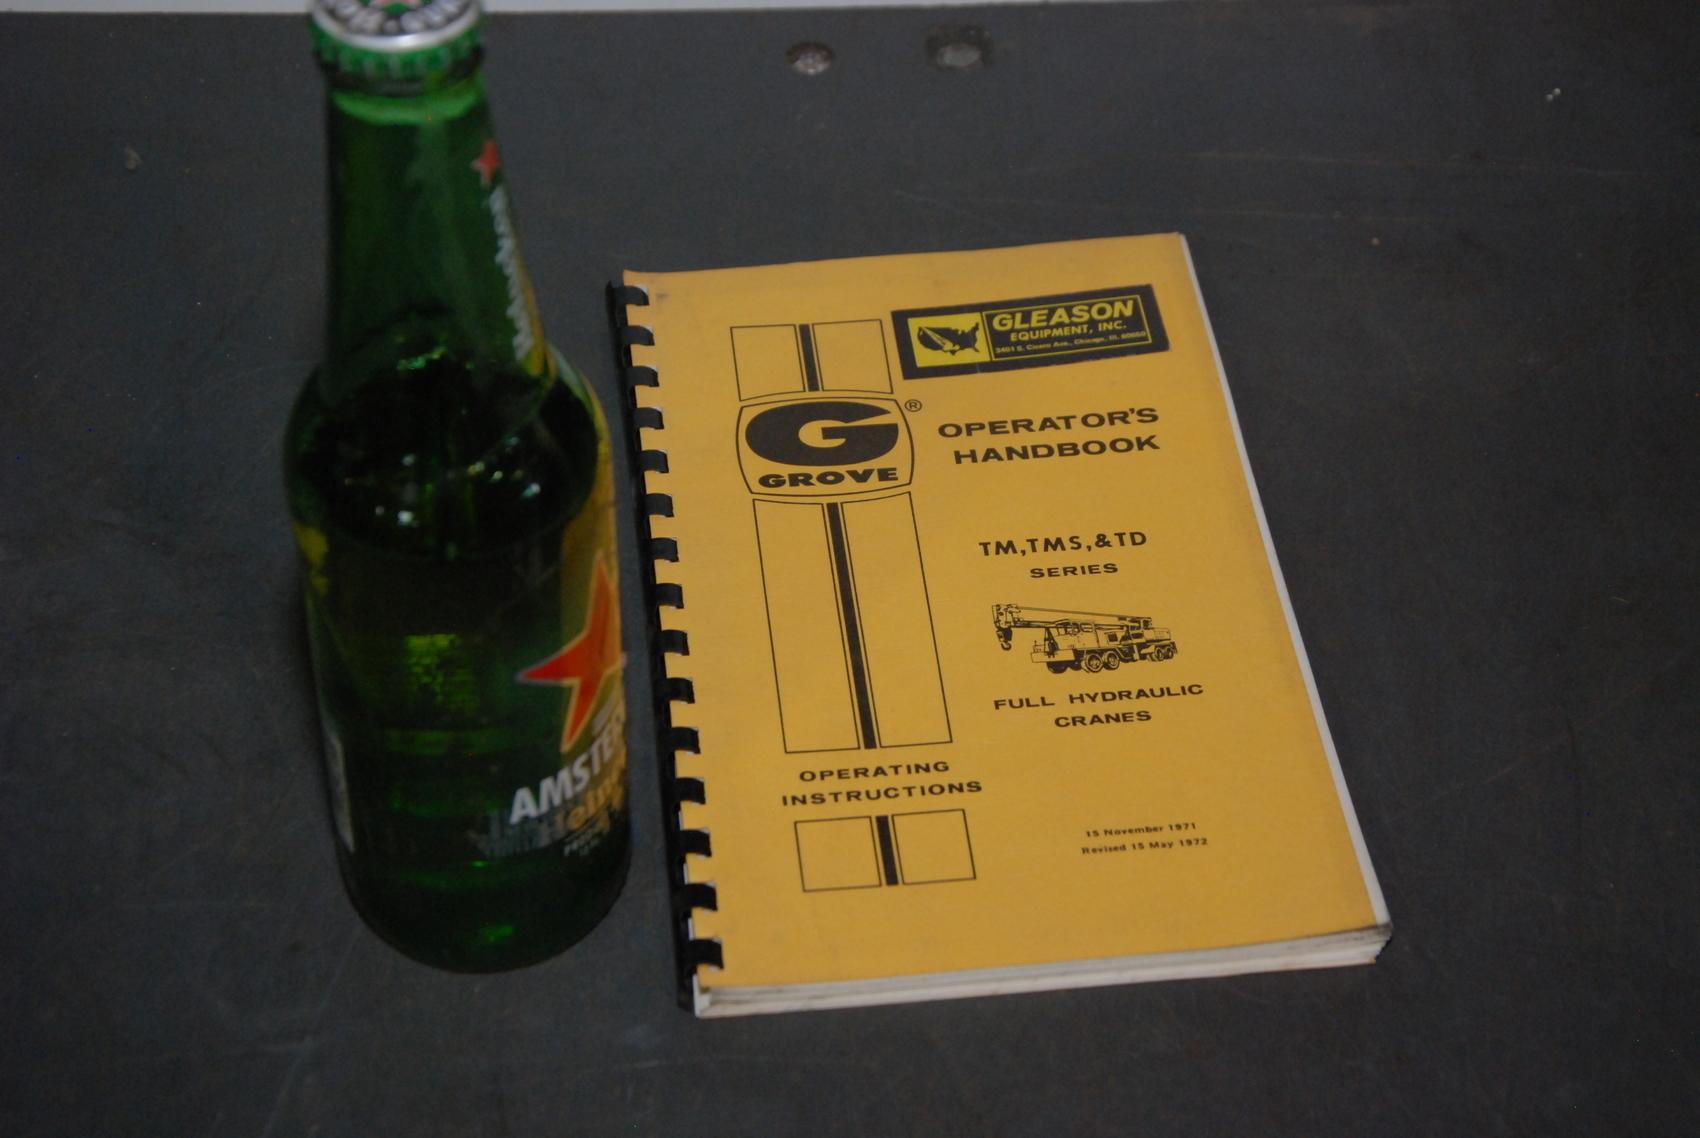 GROVE TM,TMS,TD series Crane operators handbook manual nopl